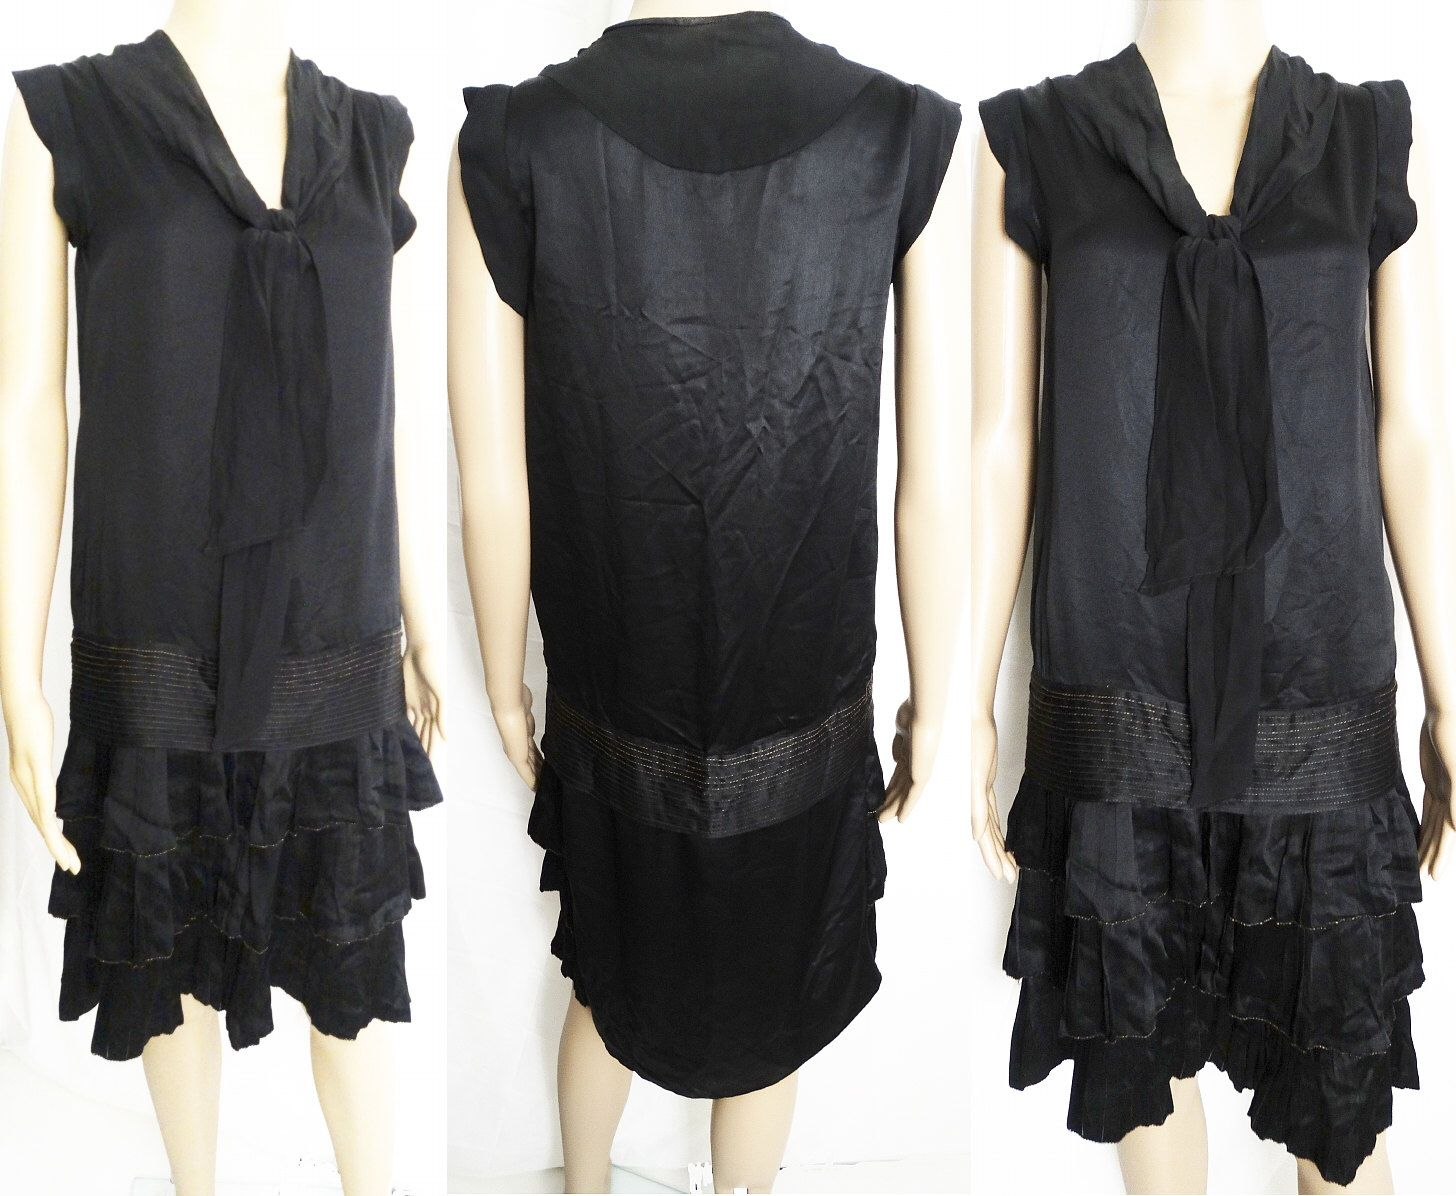 Vintage s dress s dress roaring s dress flapper